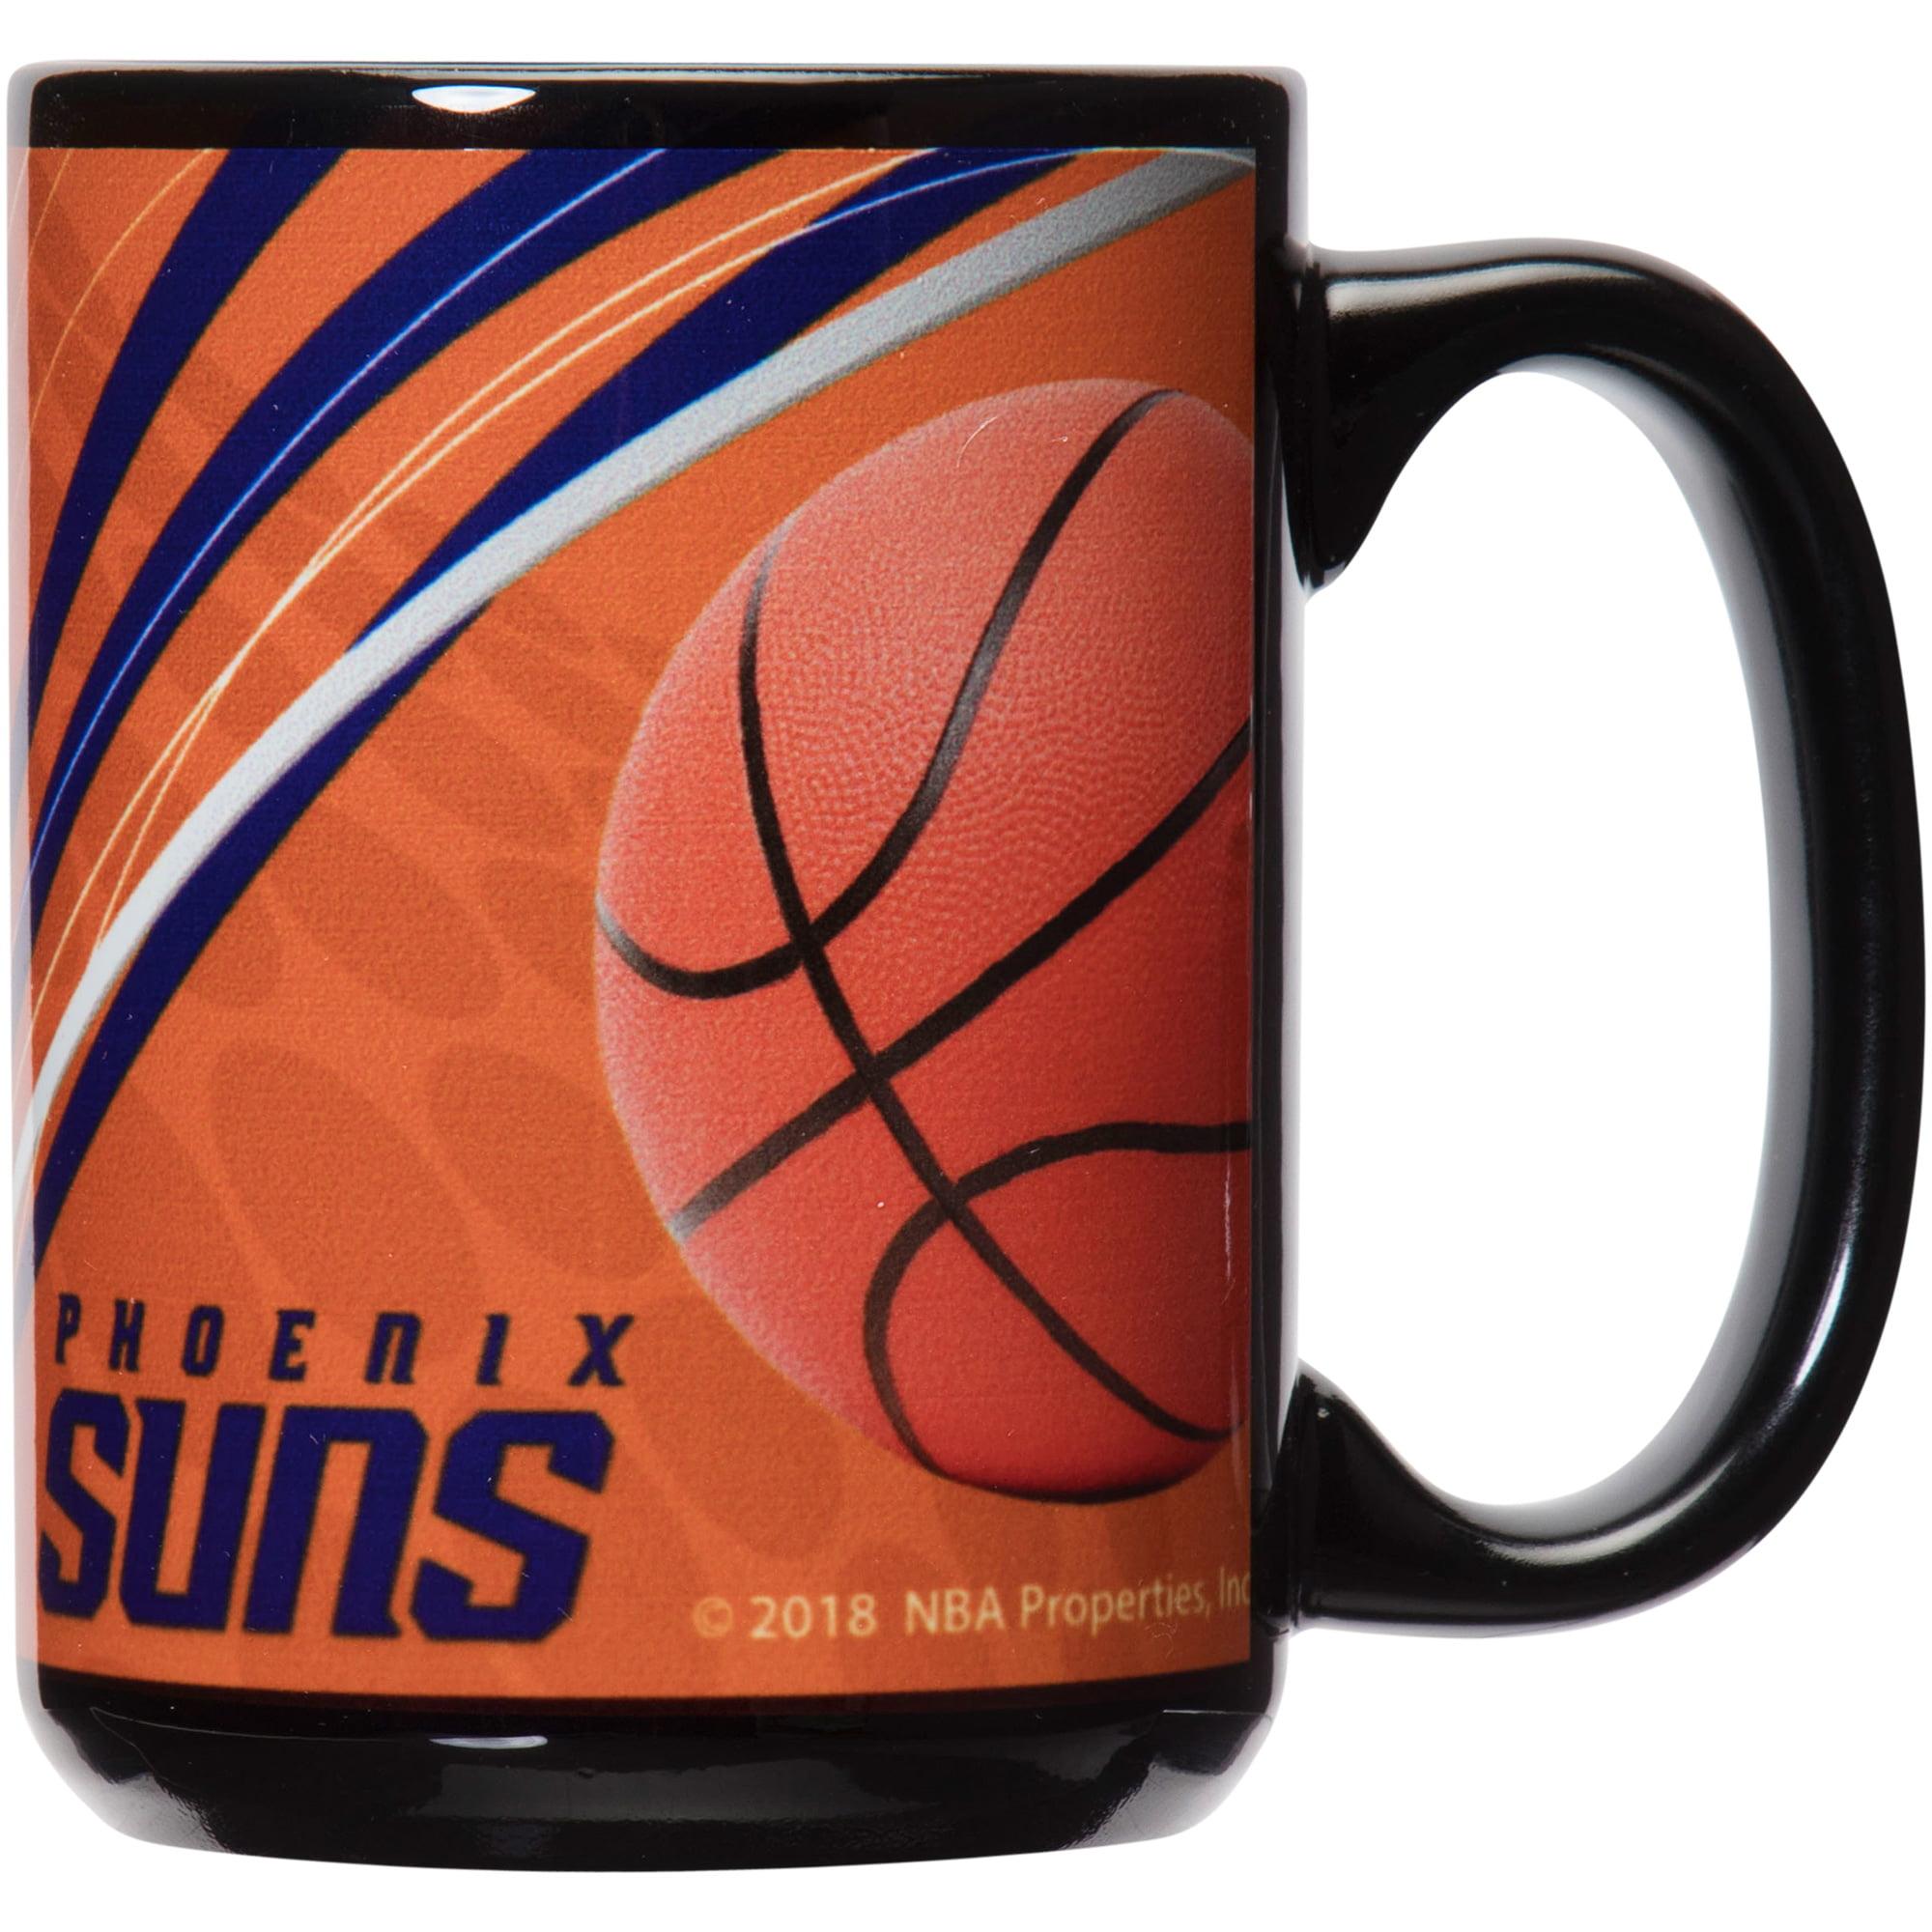 Phoenix Suns 15oz. Dynamic Mug - No Size